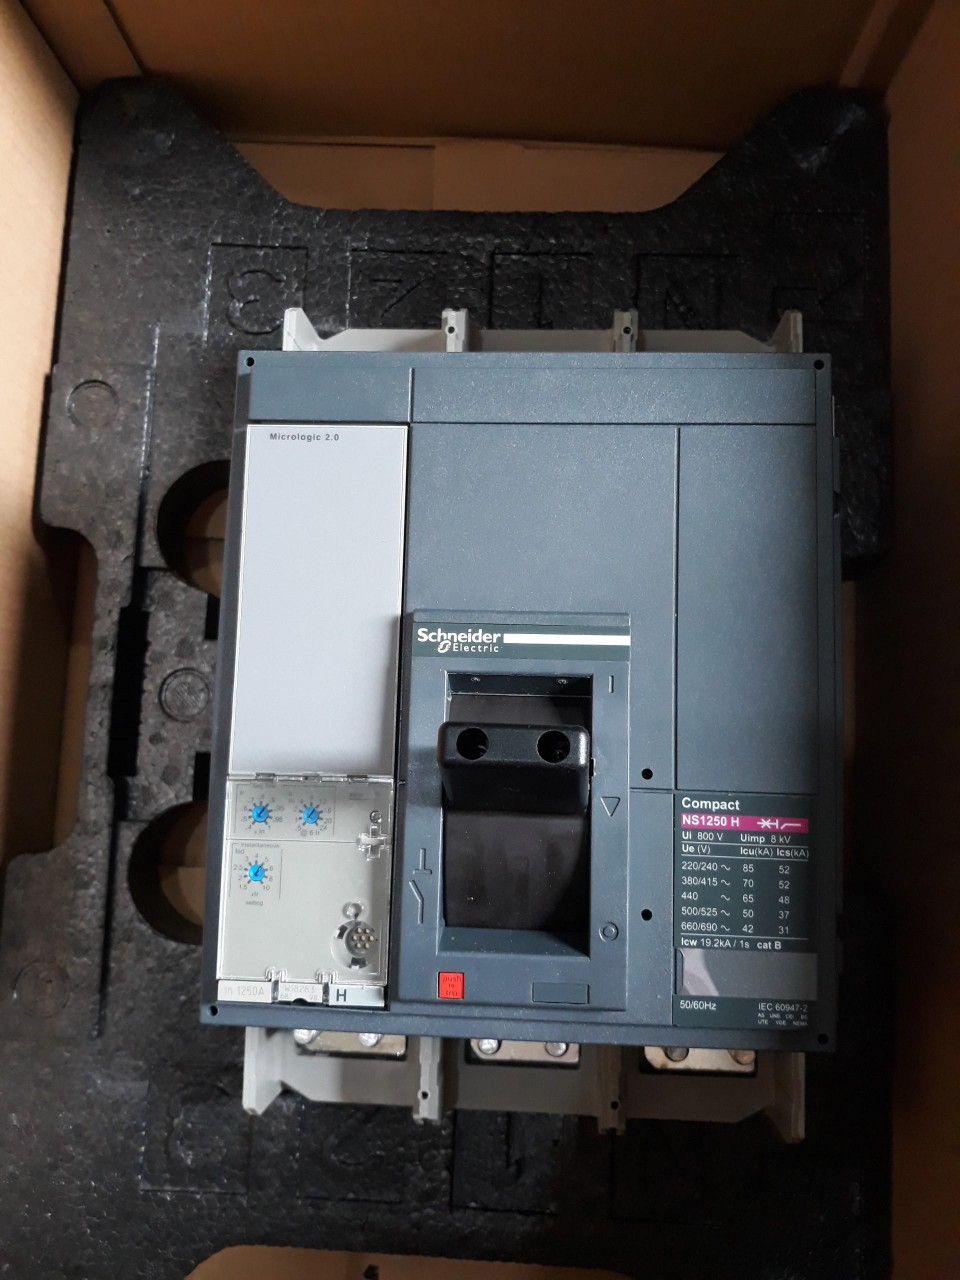 MCCB NS1250H - 3P 1250A 70kA - NS125H3M2 Schneider